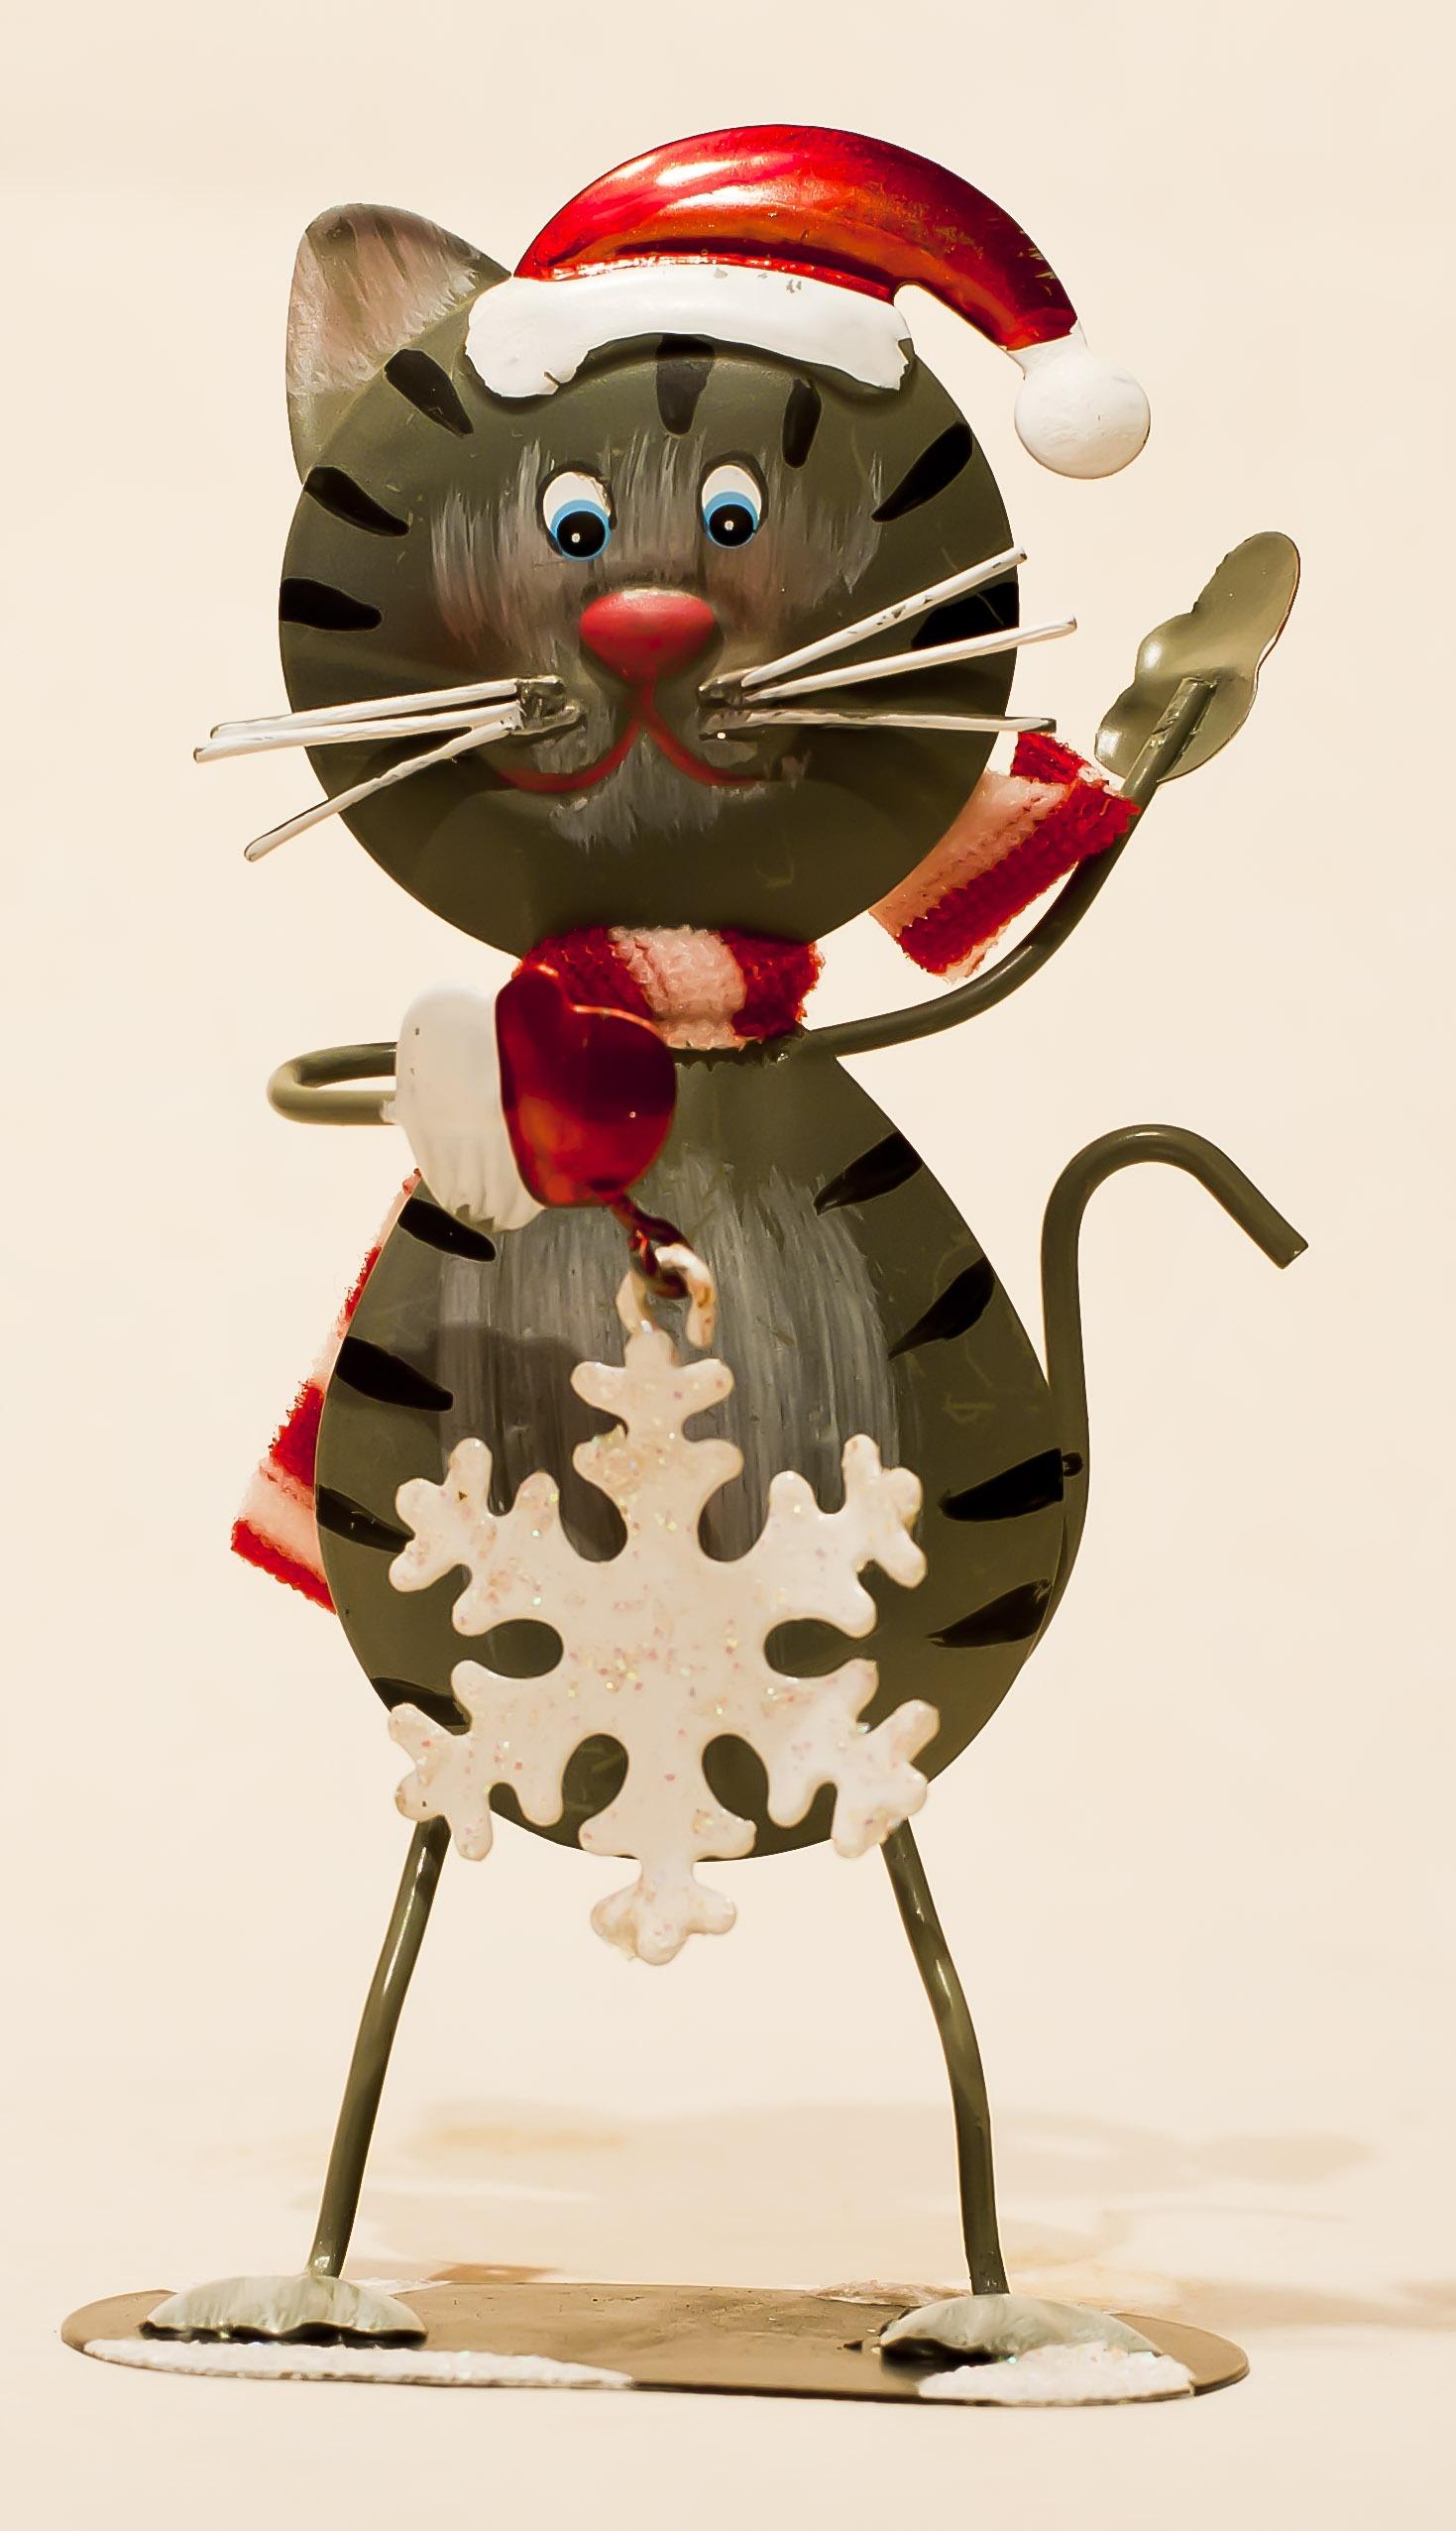 Gambar Bintang Dekorasi Kucing Hari Natal Mainan Syal